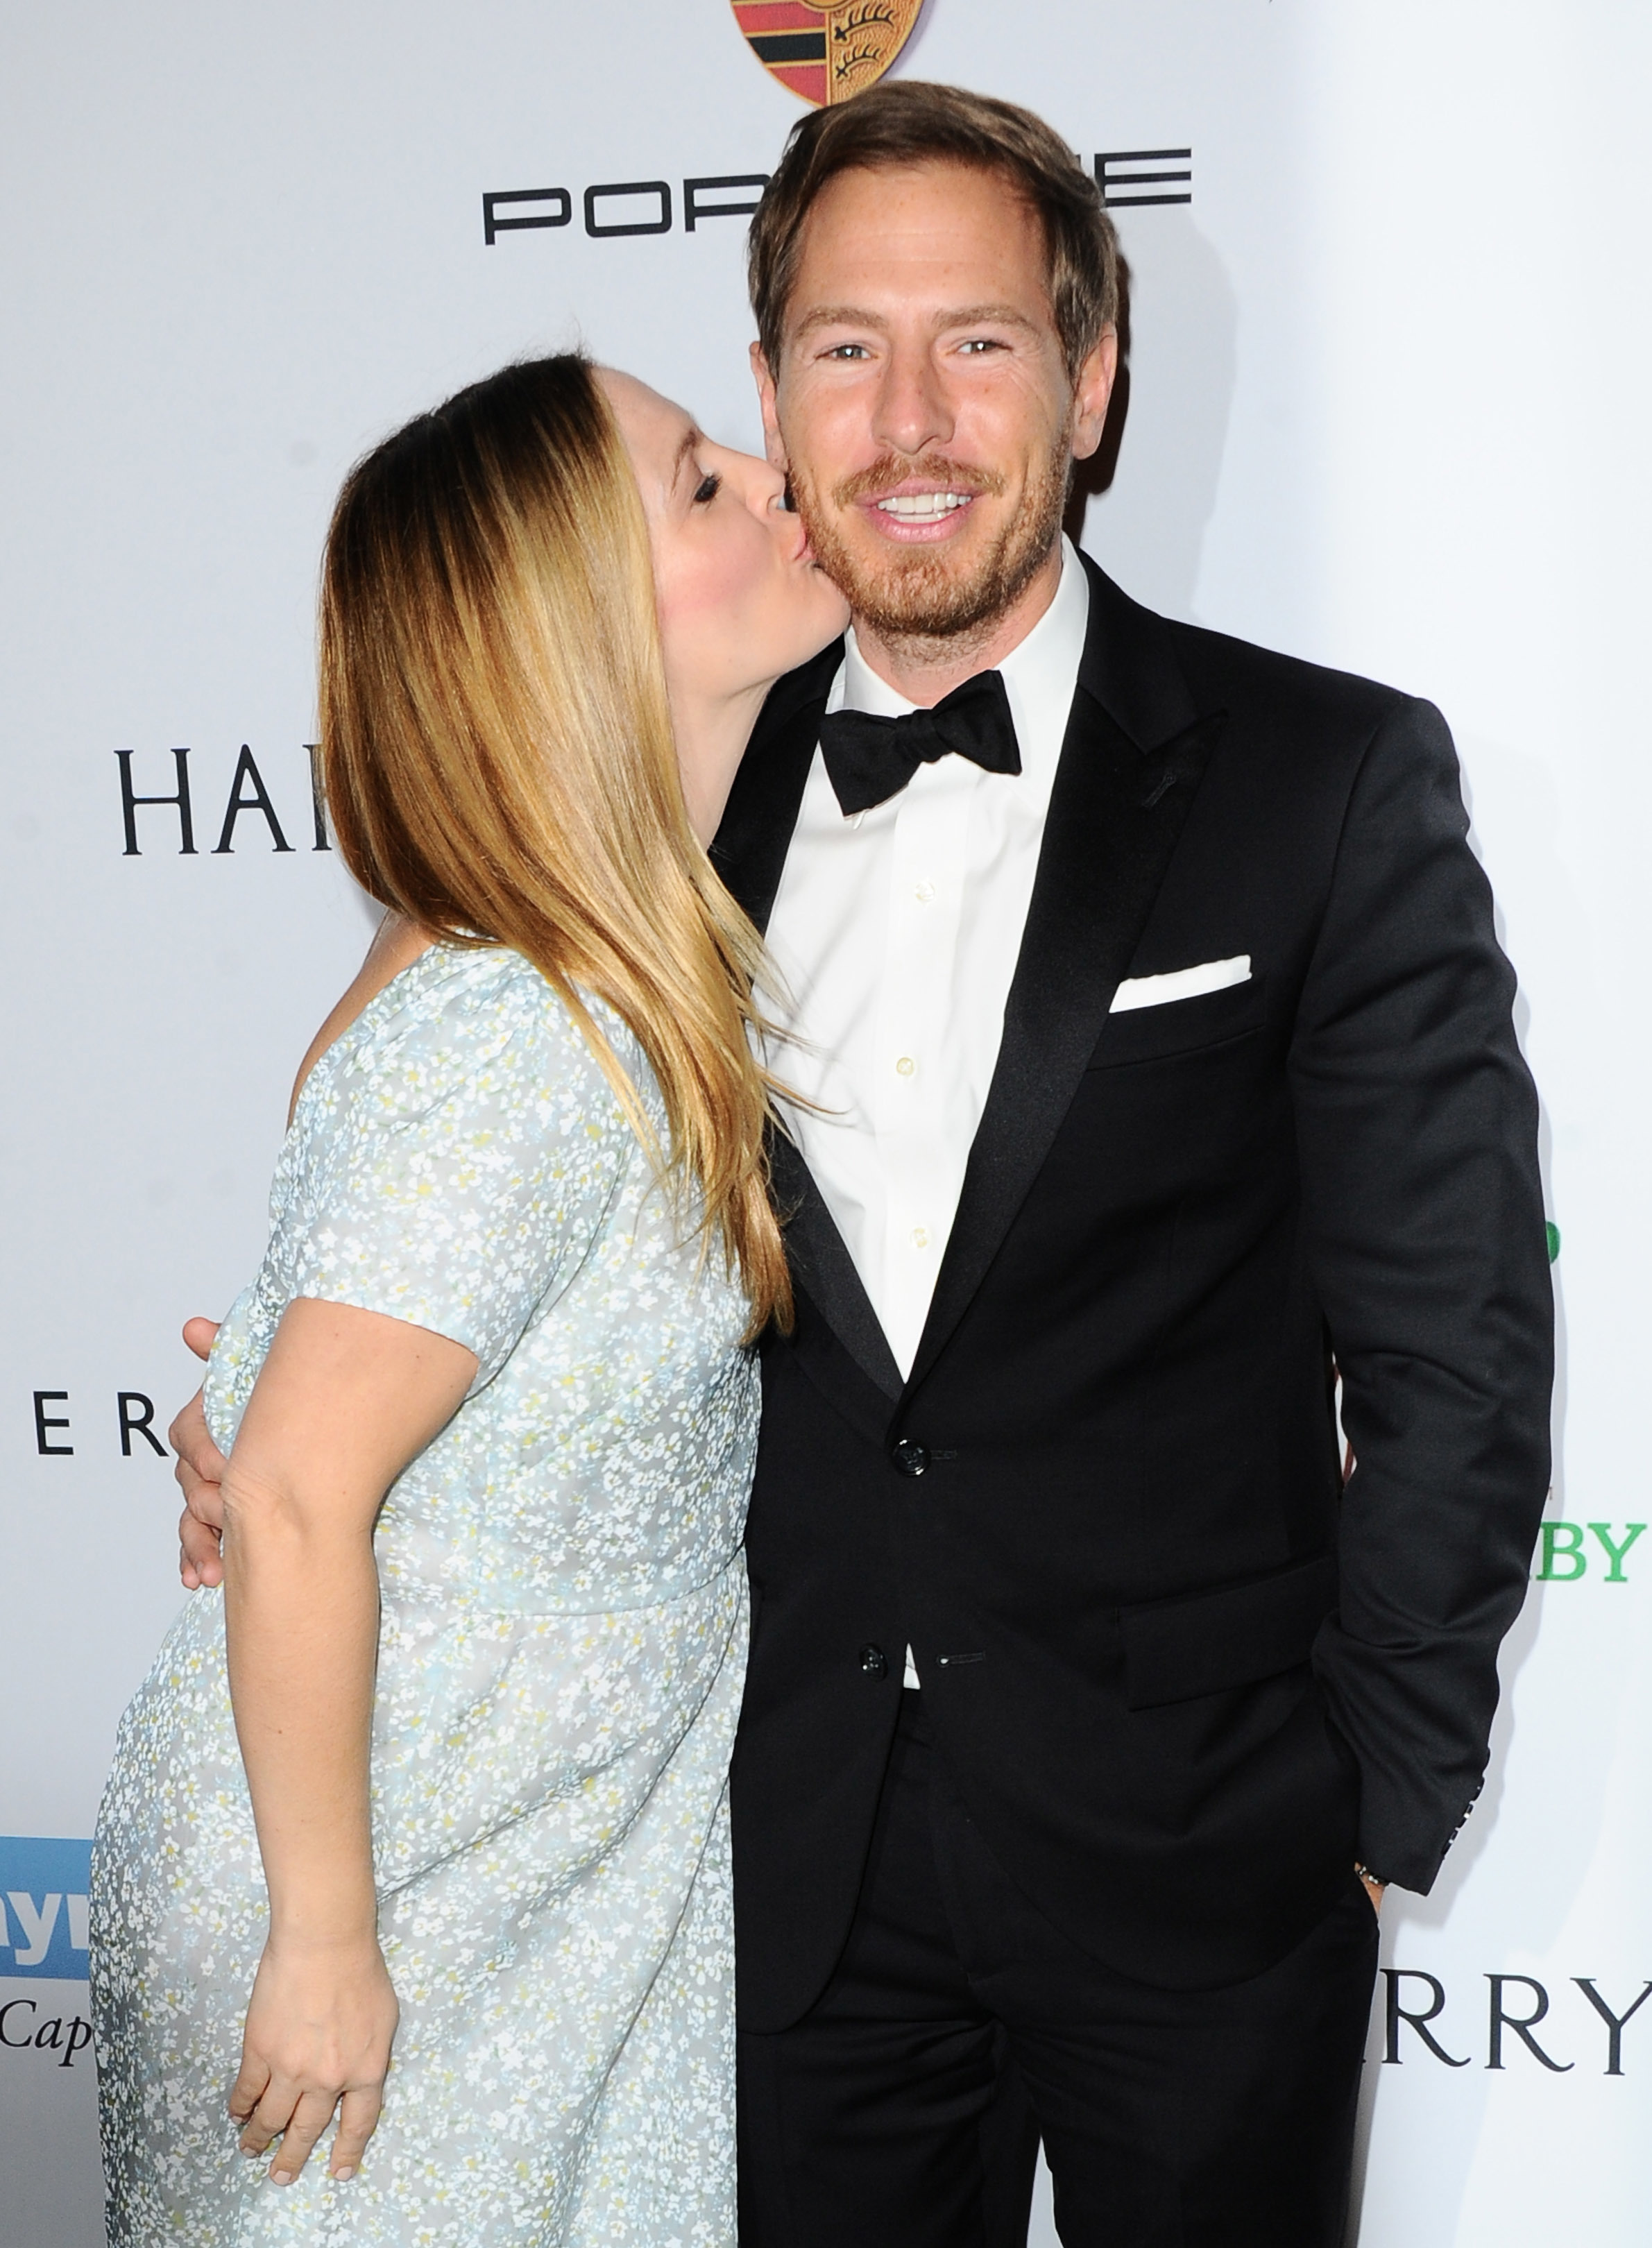 Drew Barrymore and husband Will Kopelman are divorcing | Wonderwall.com